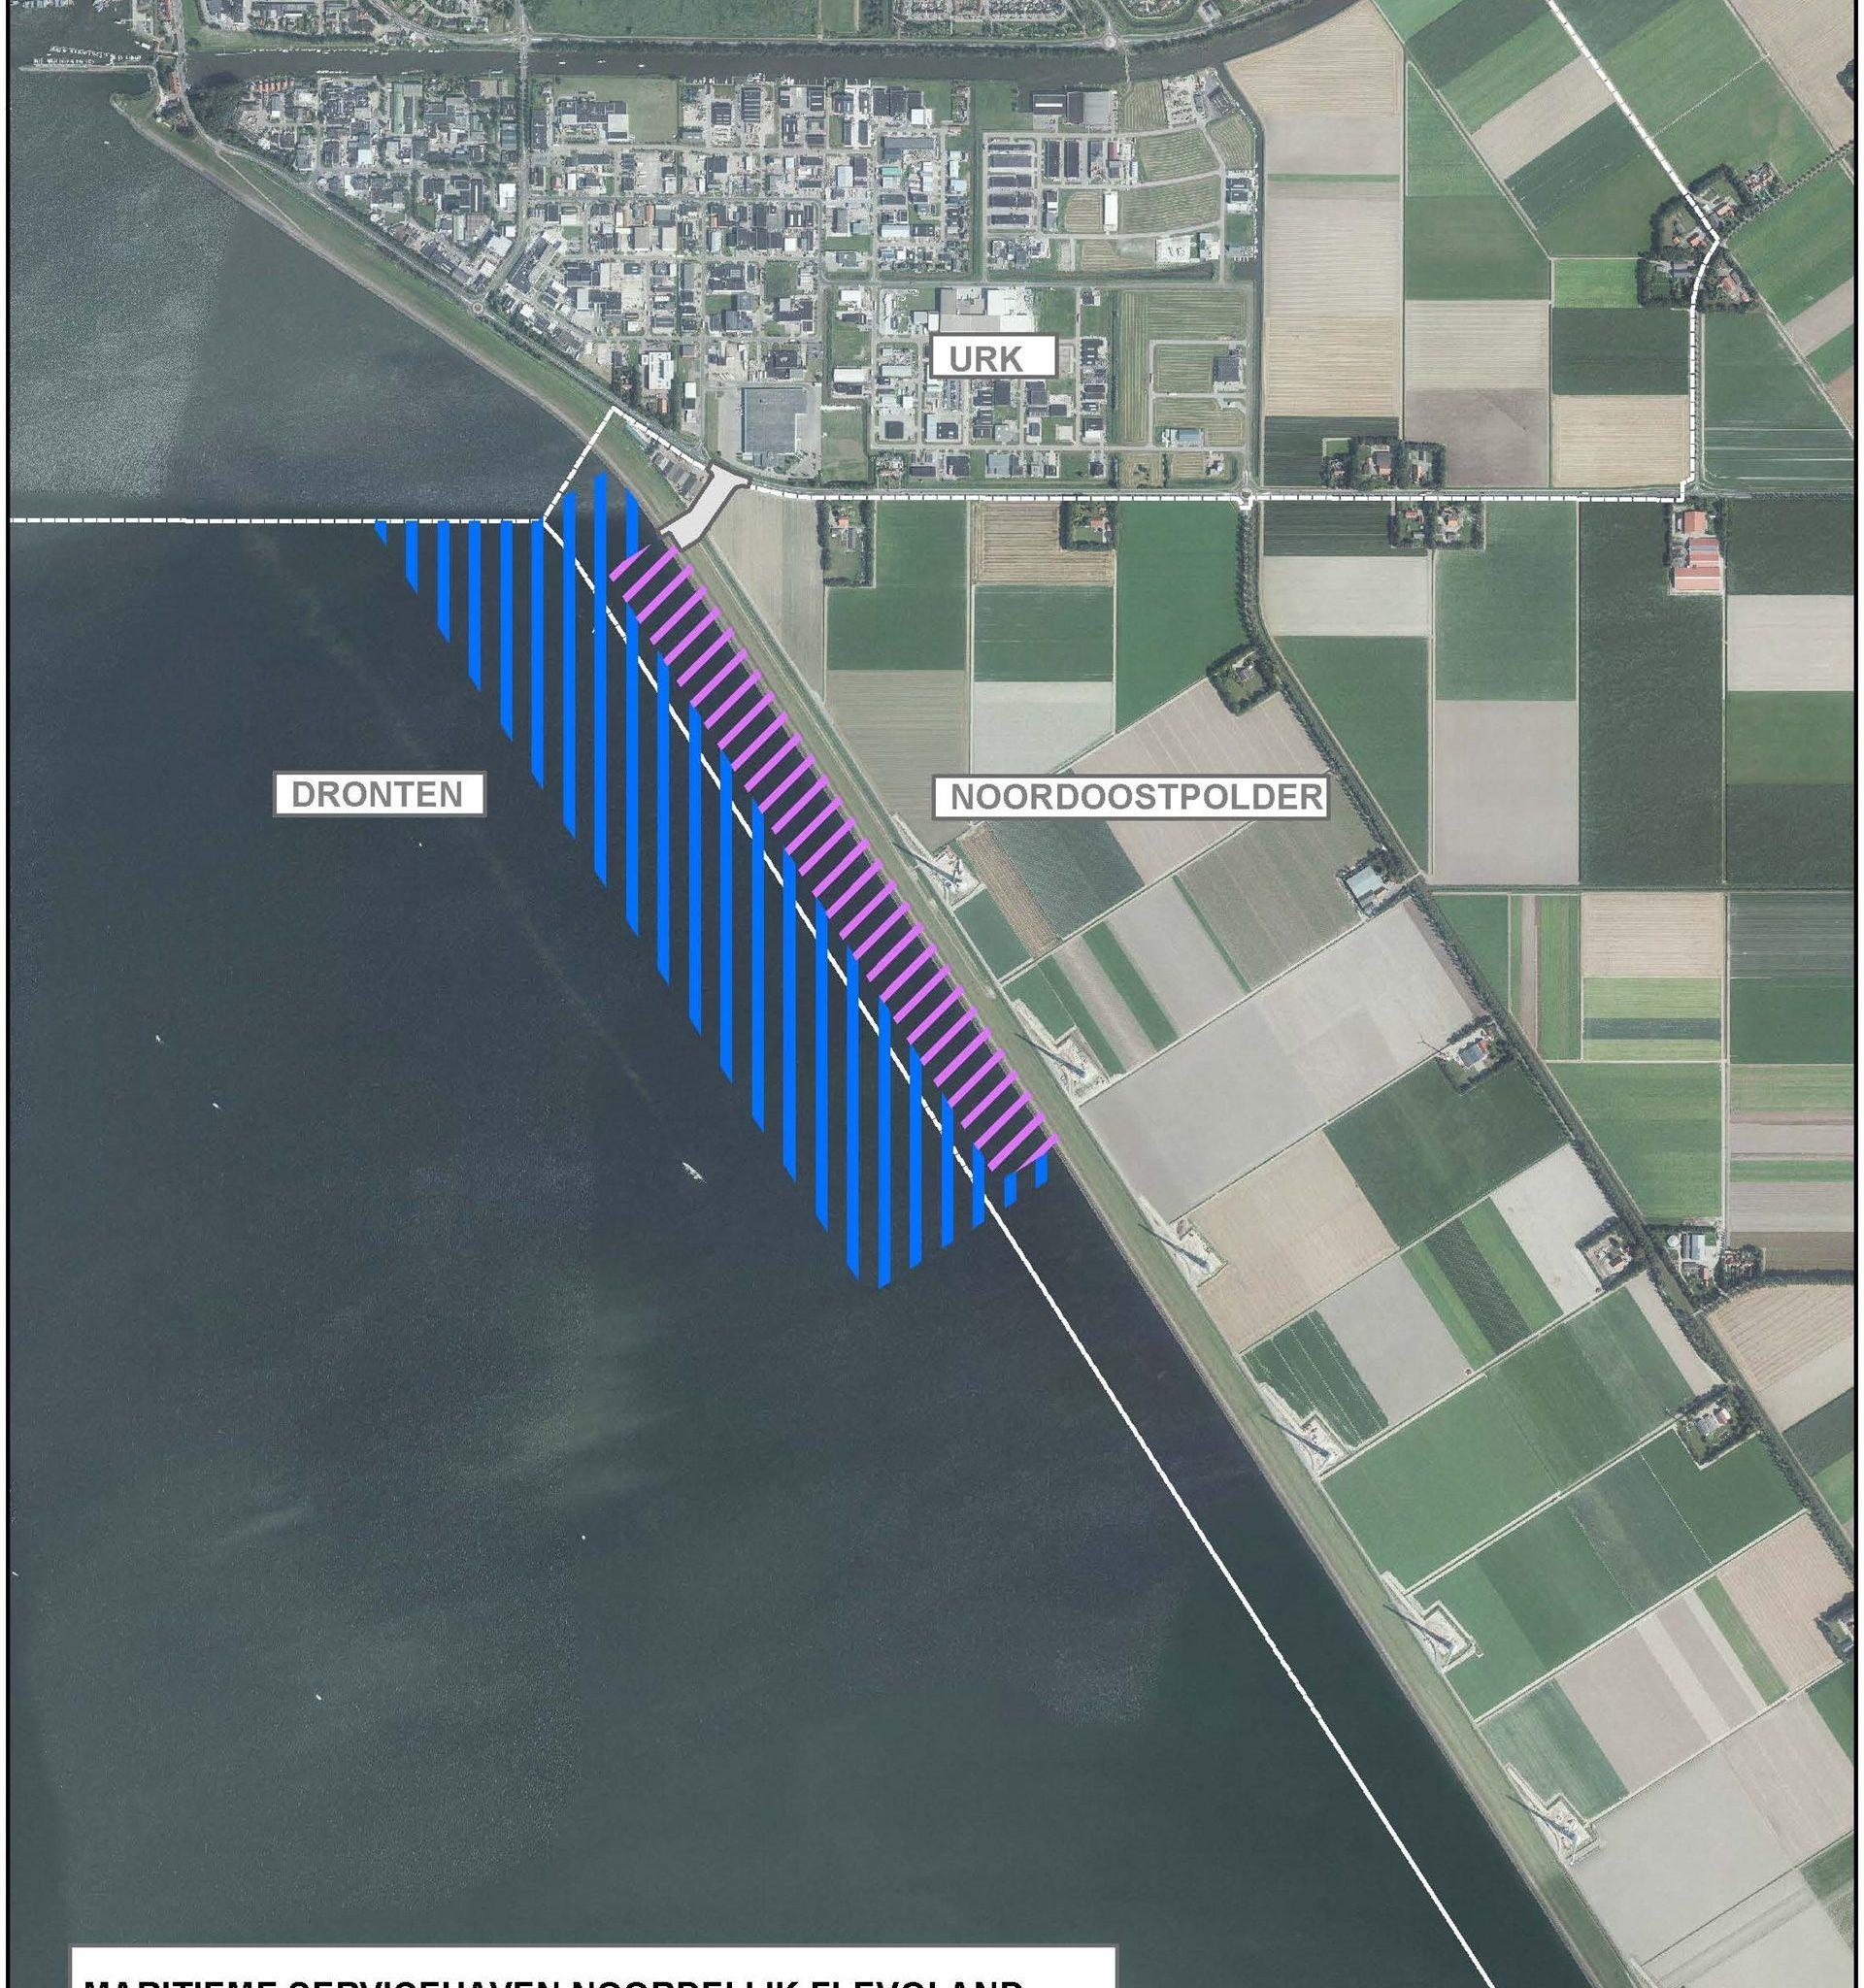 Plattegrond Maritieme Servicehaven Urk Bron provincie Flevoland